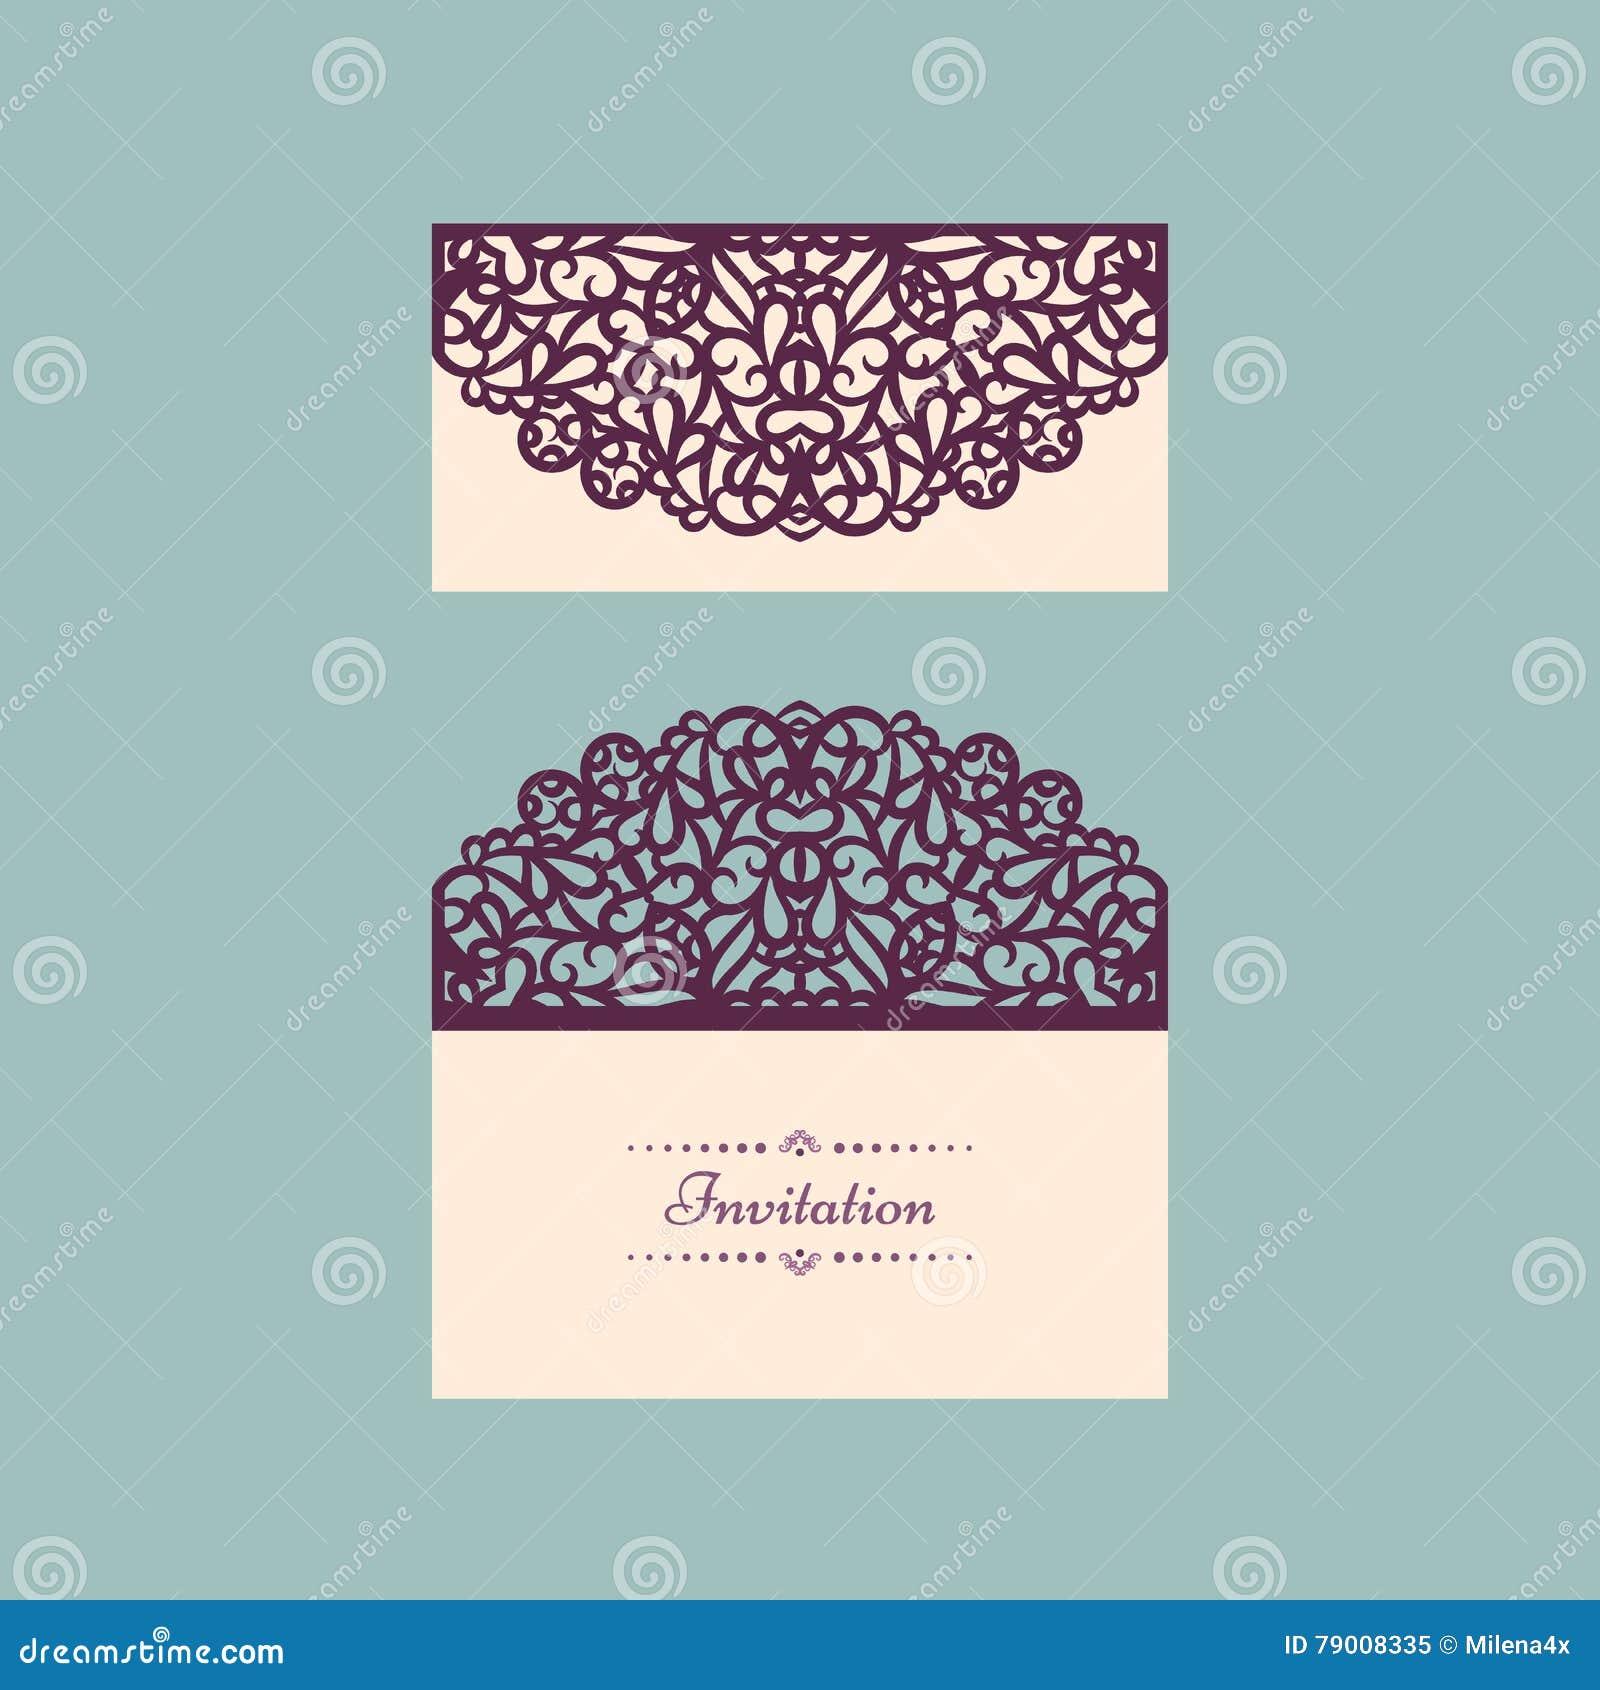 Lazercut Vector Wedding Invitation Template Envelope For Laser Cutting Lace Gate Folds